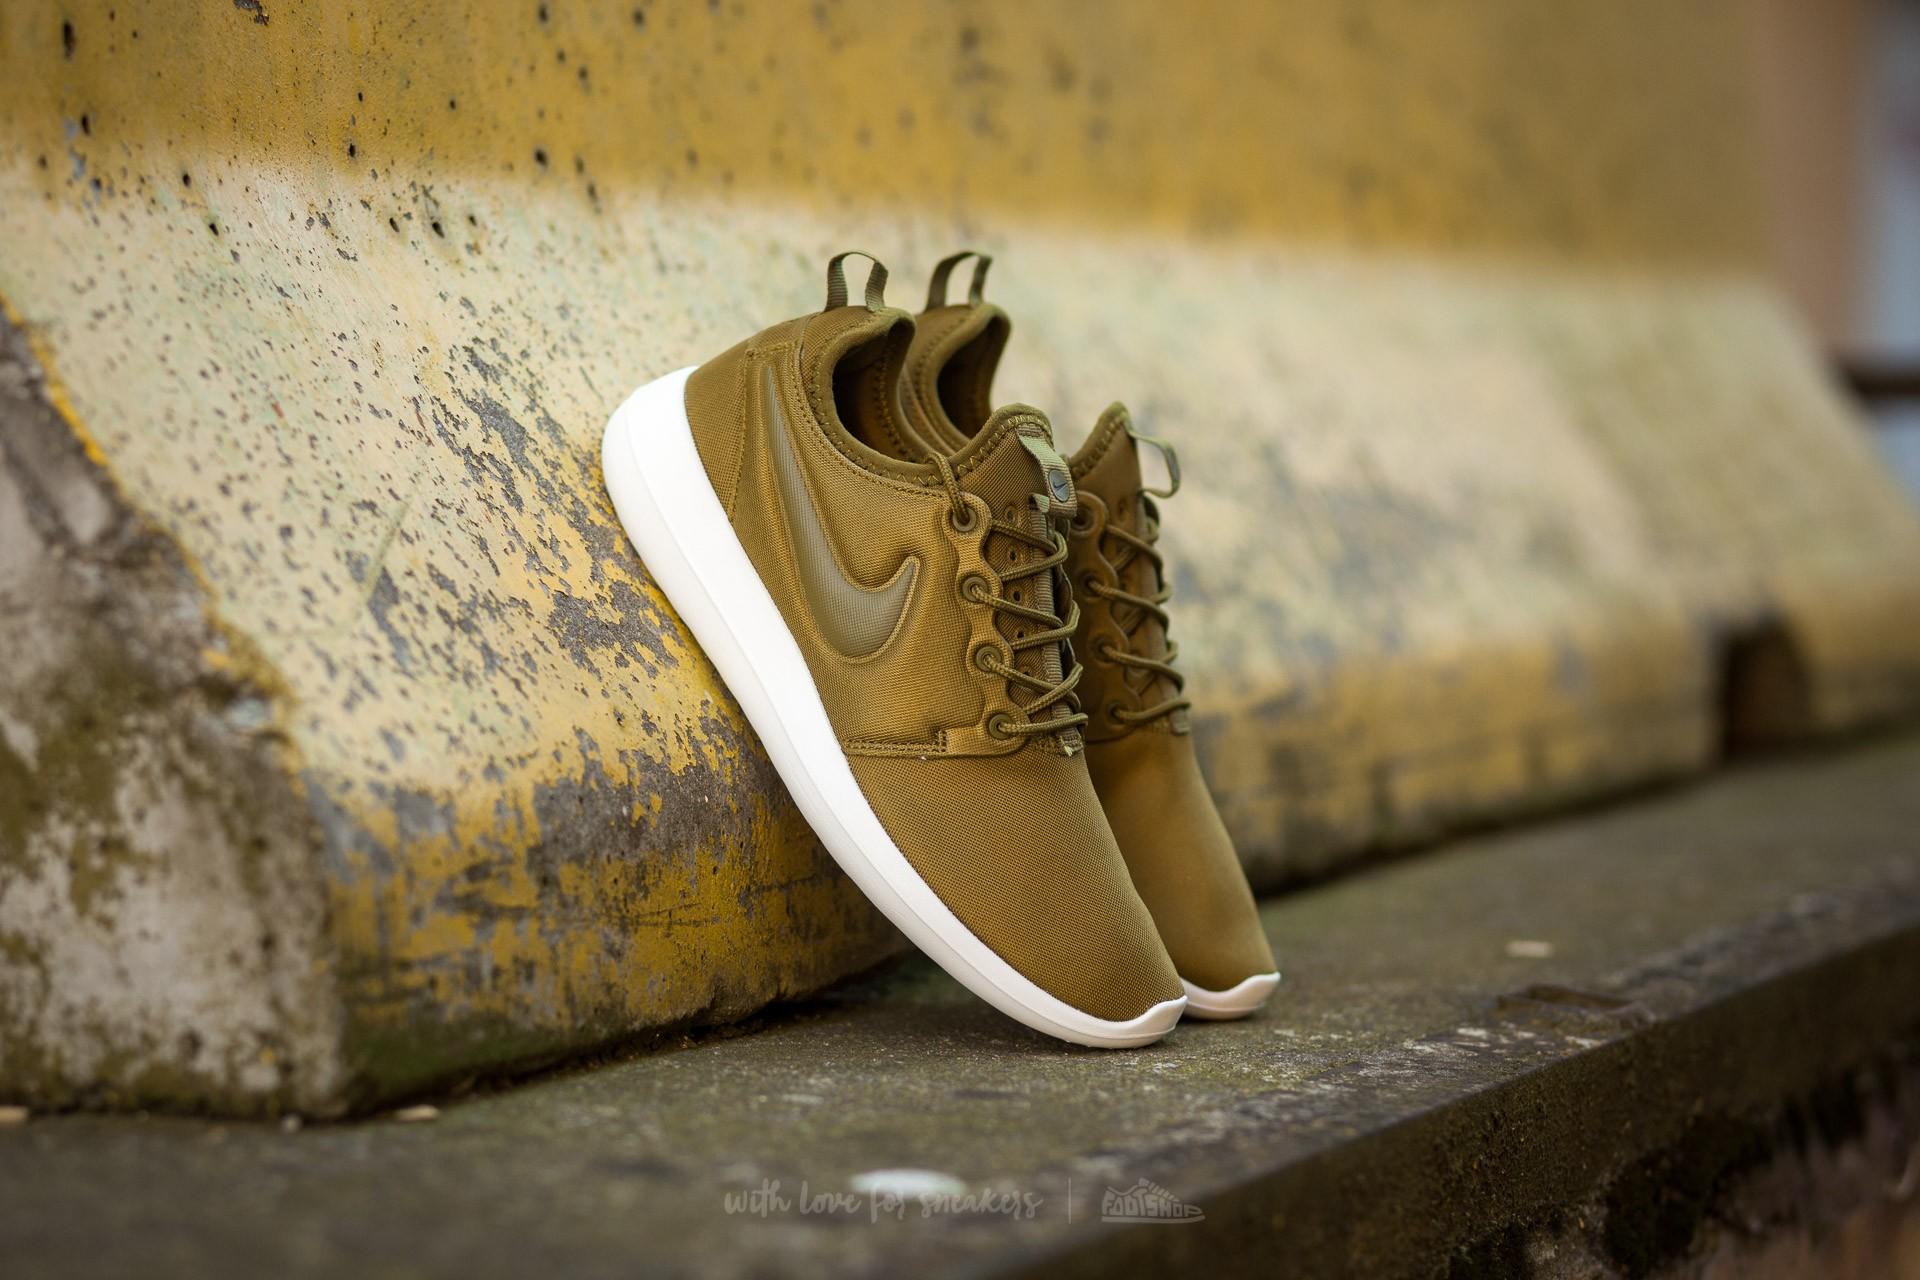 huge discount 03c82 517d2 Nike W Roshe Two Olive Flak/ Olive Flak-Sail-Dark Loden | Footshop